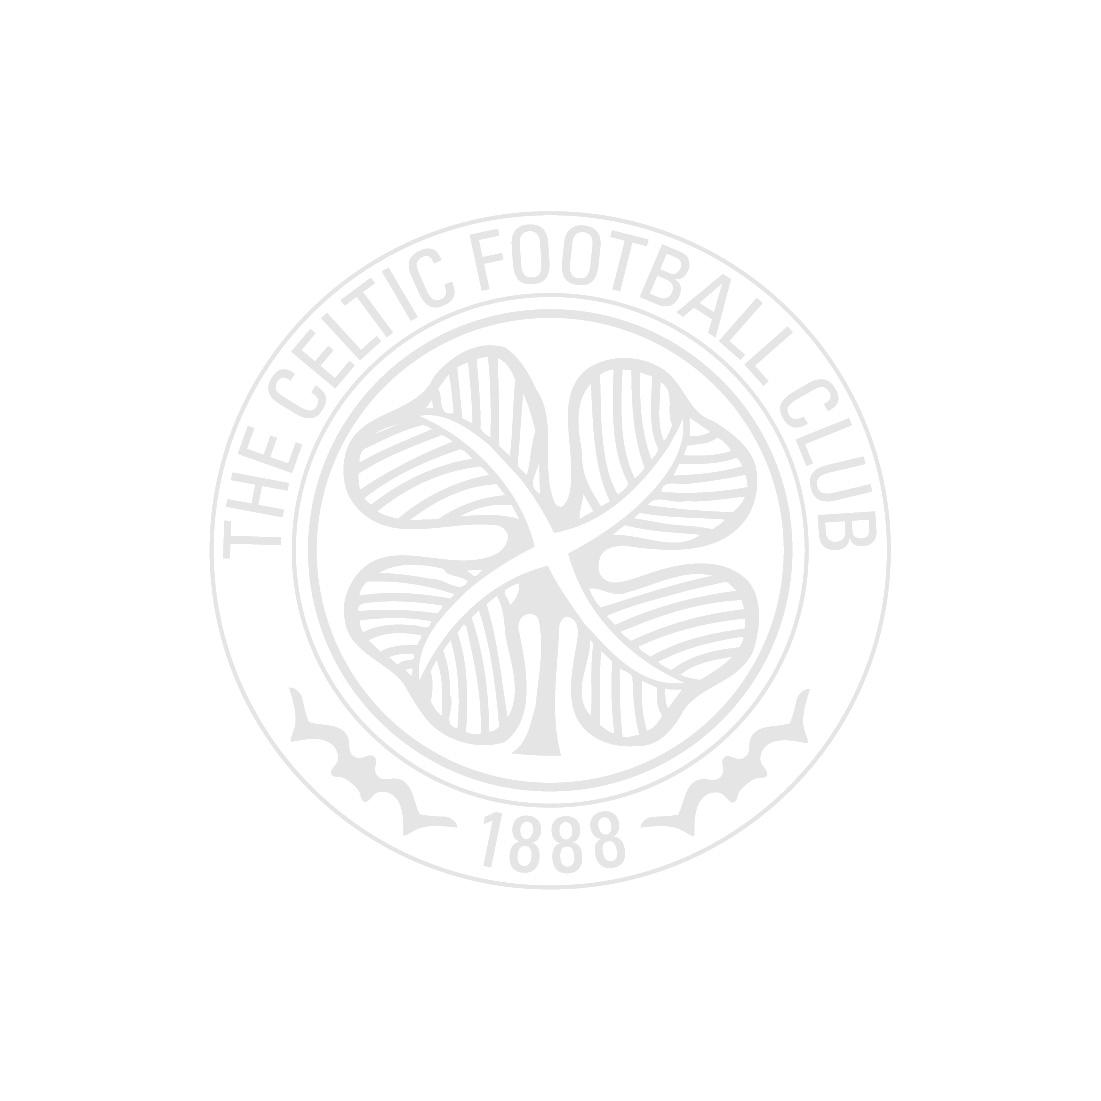 Celtic Battle For The Club's Soul - Volume 2